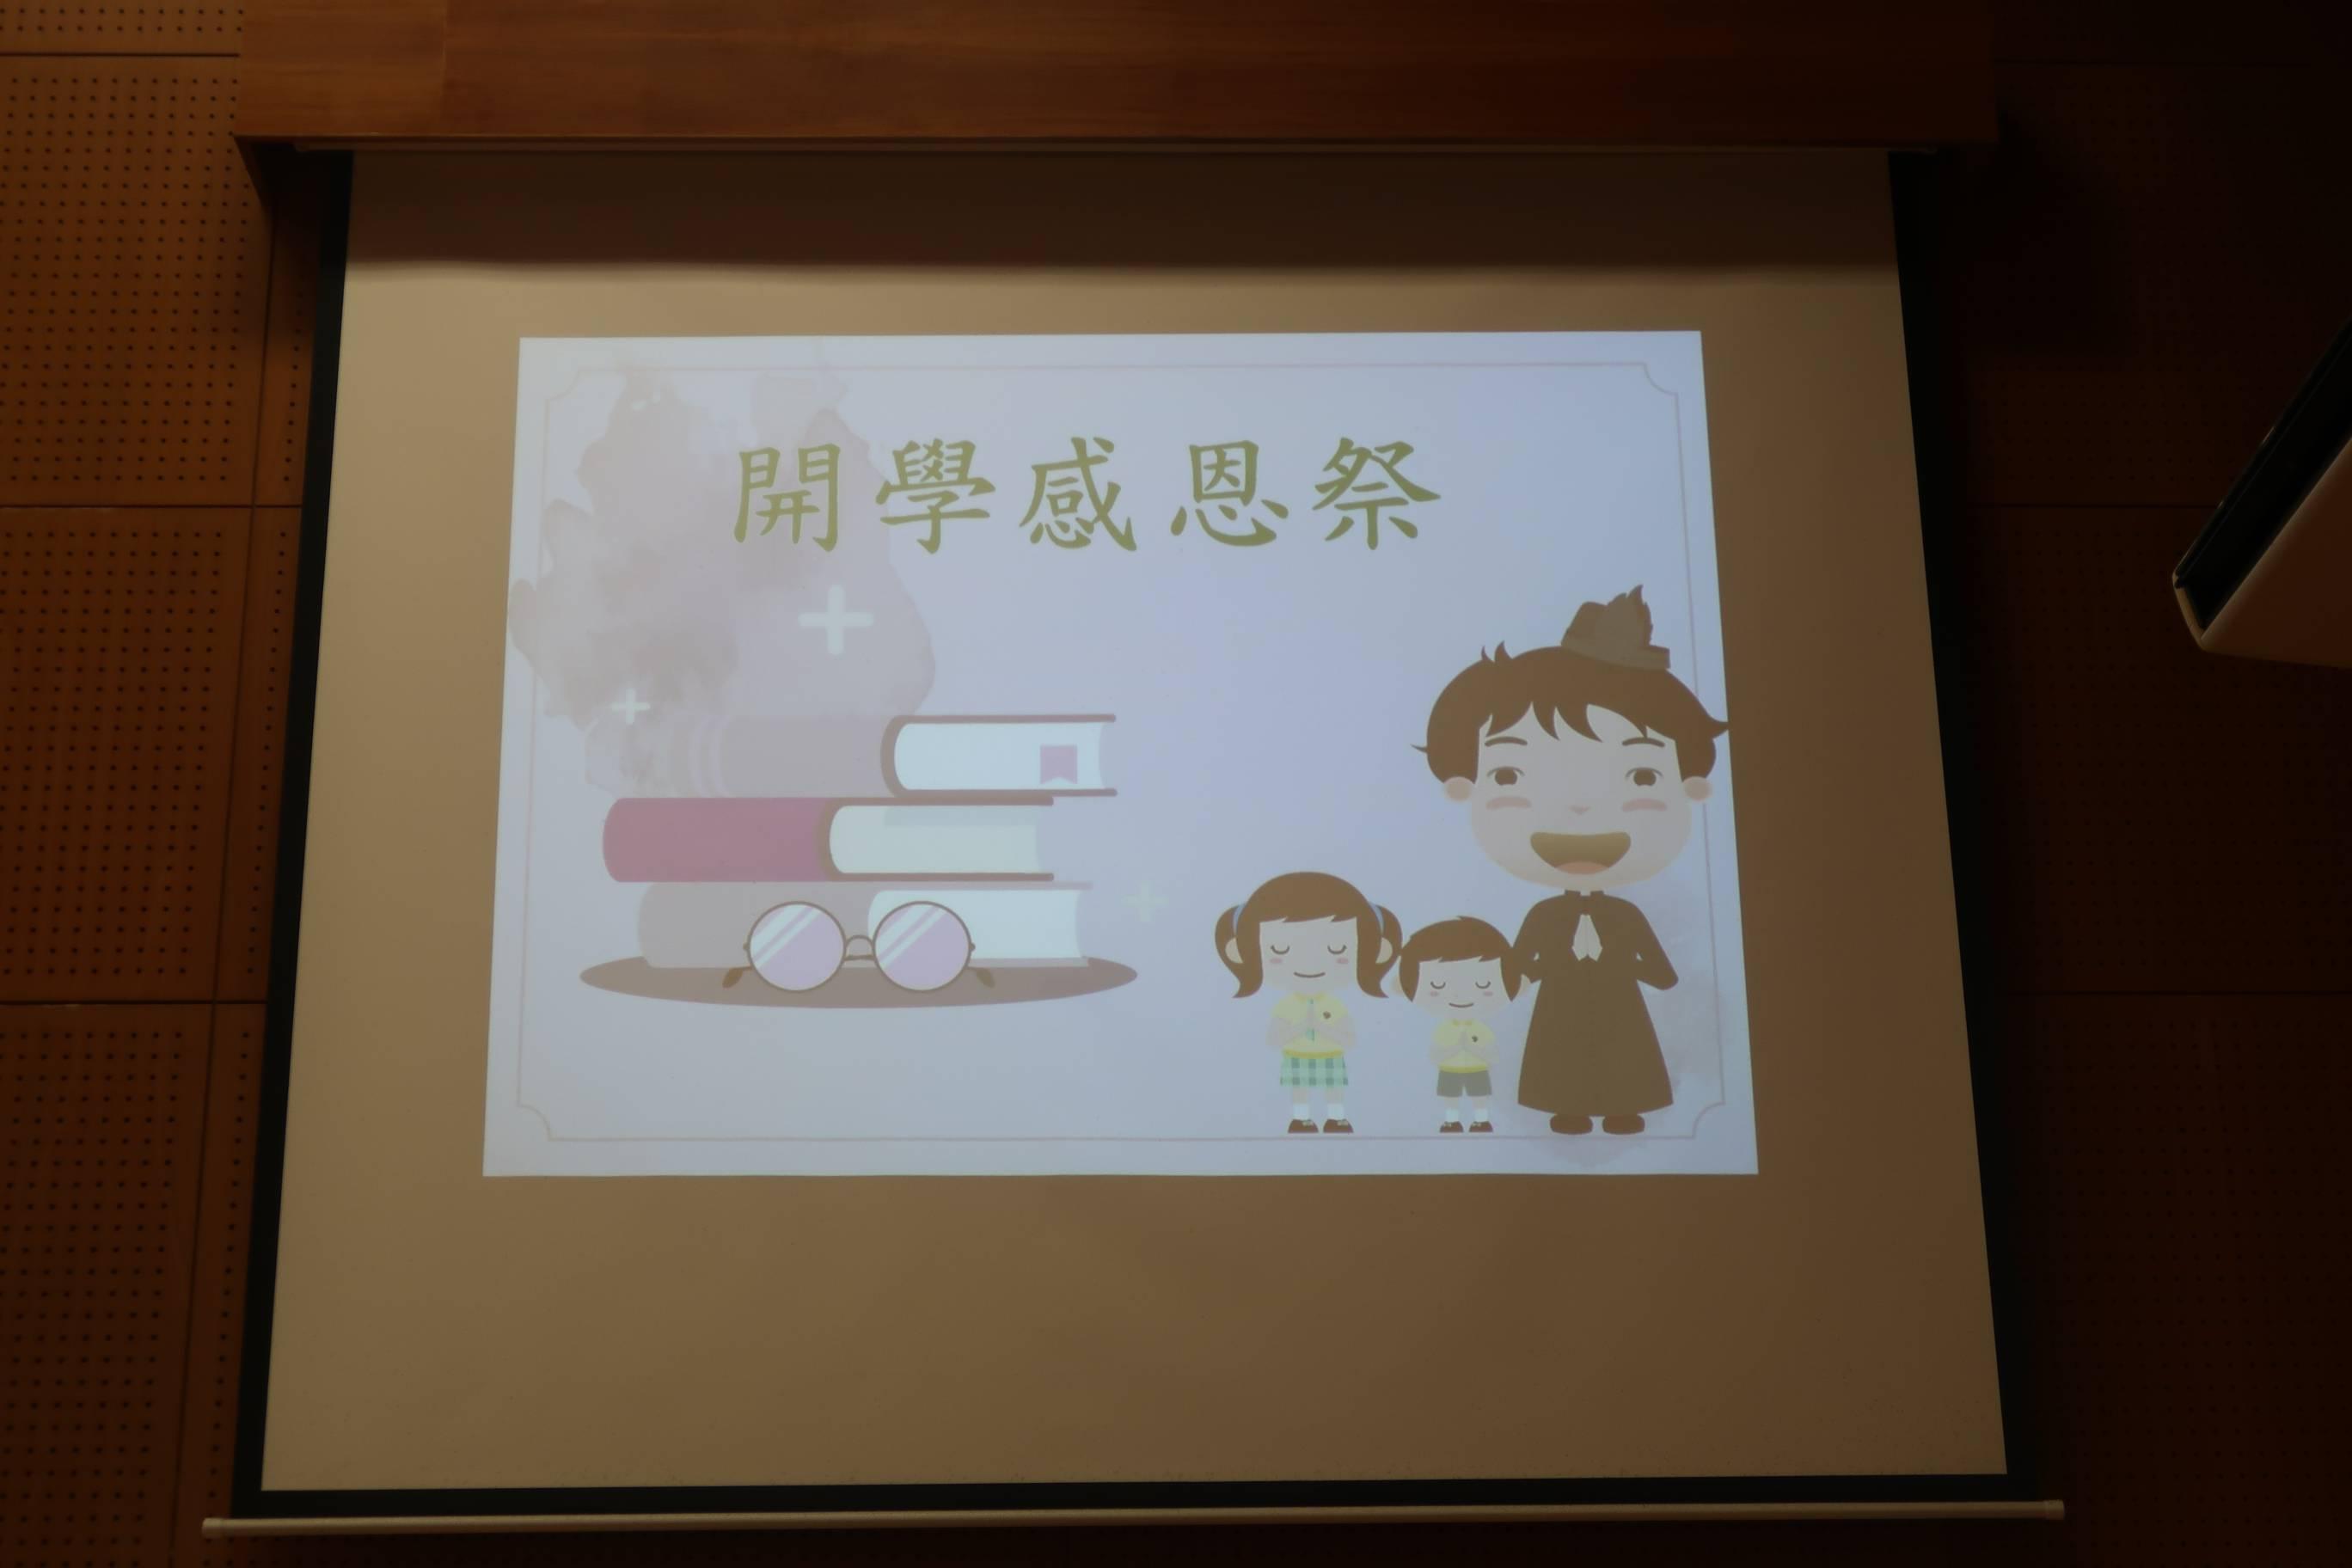 https://syh.edu.hk/sites/default/files/img_6996.jpg